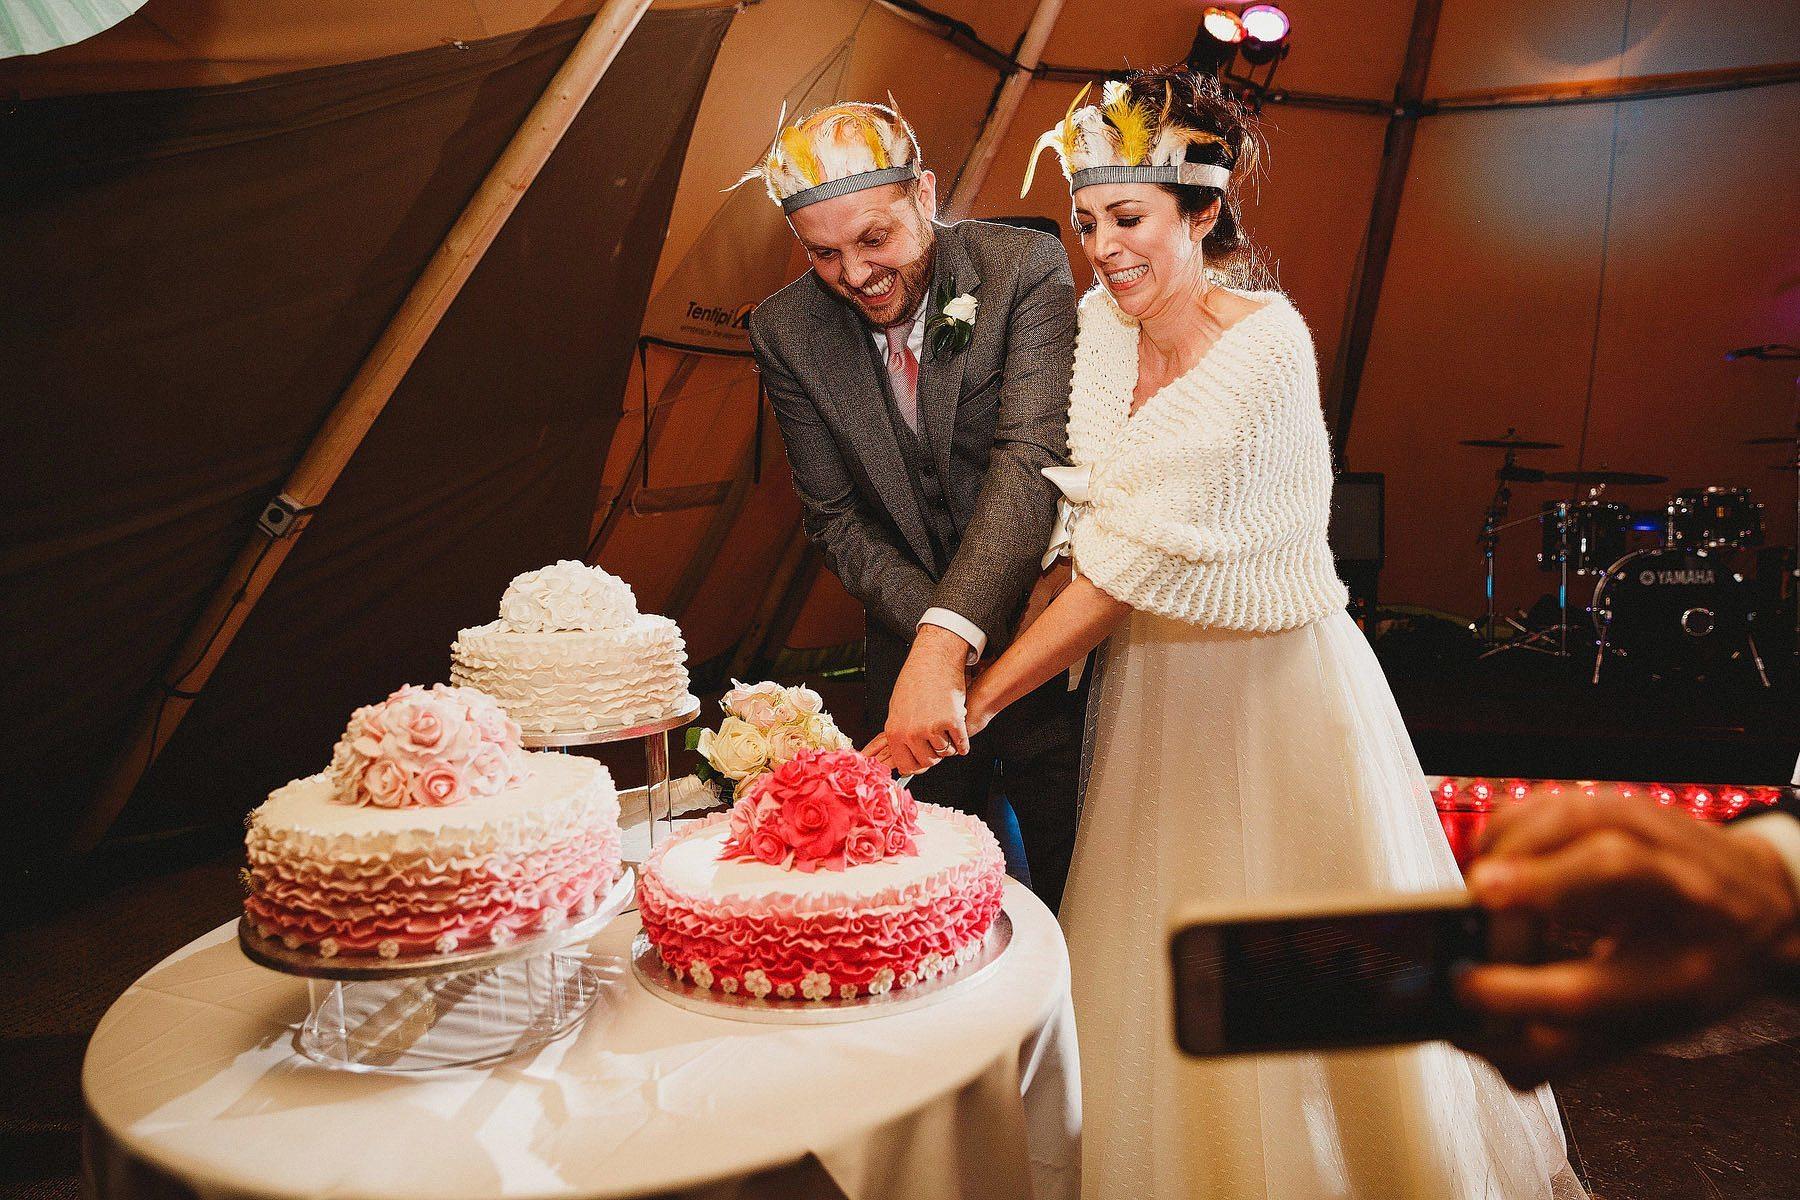 funny cake cut wedding photo